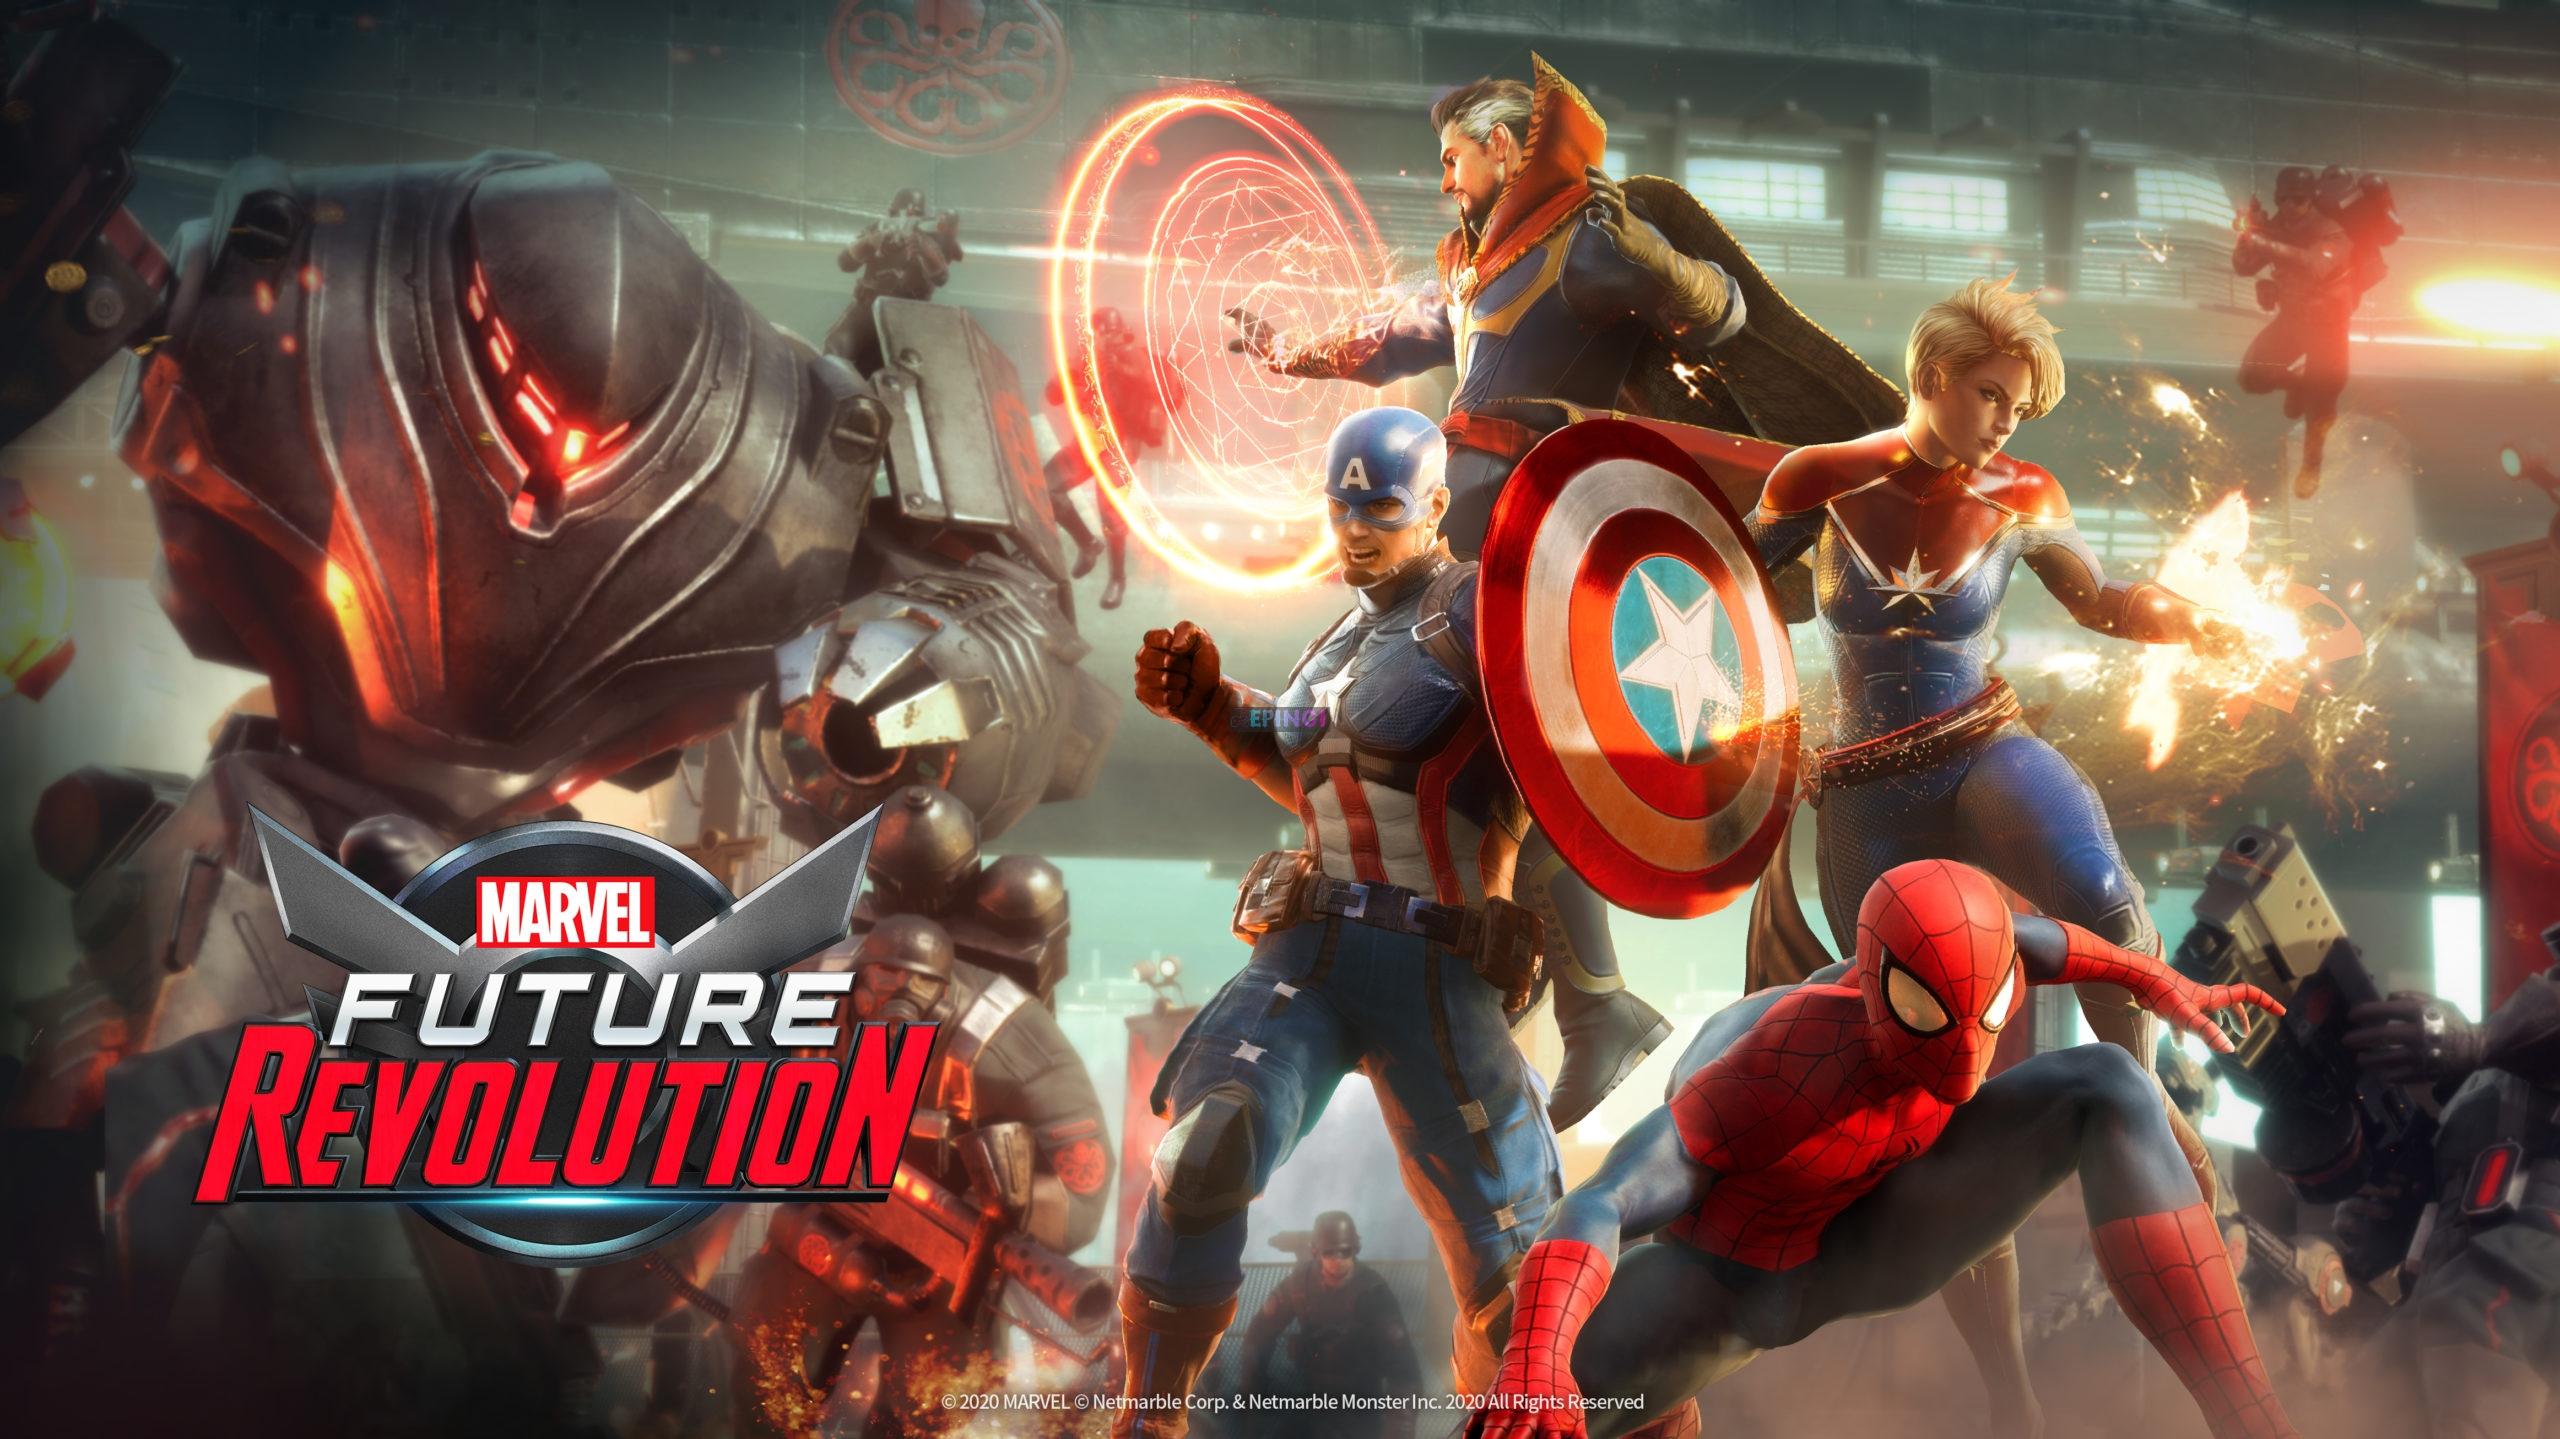 Marvel Future Revolution release date confirmed